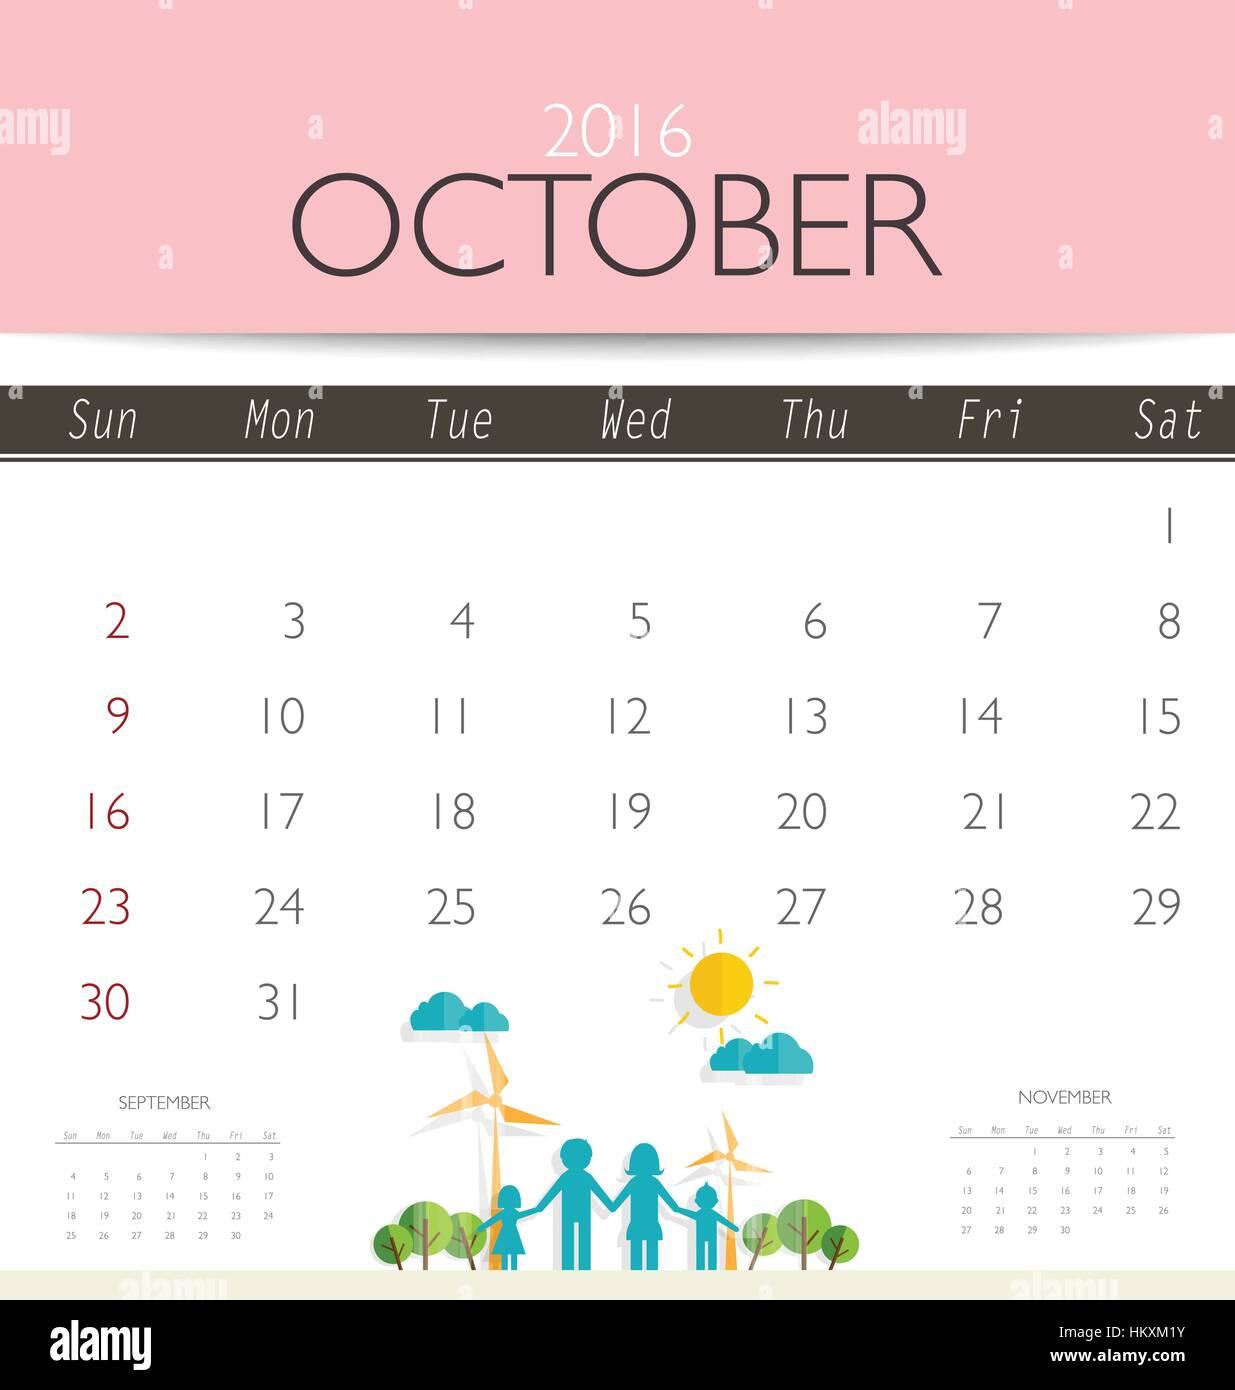 Simple Calendar October 2016 Stockfotos & Simple Calendar October ...